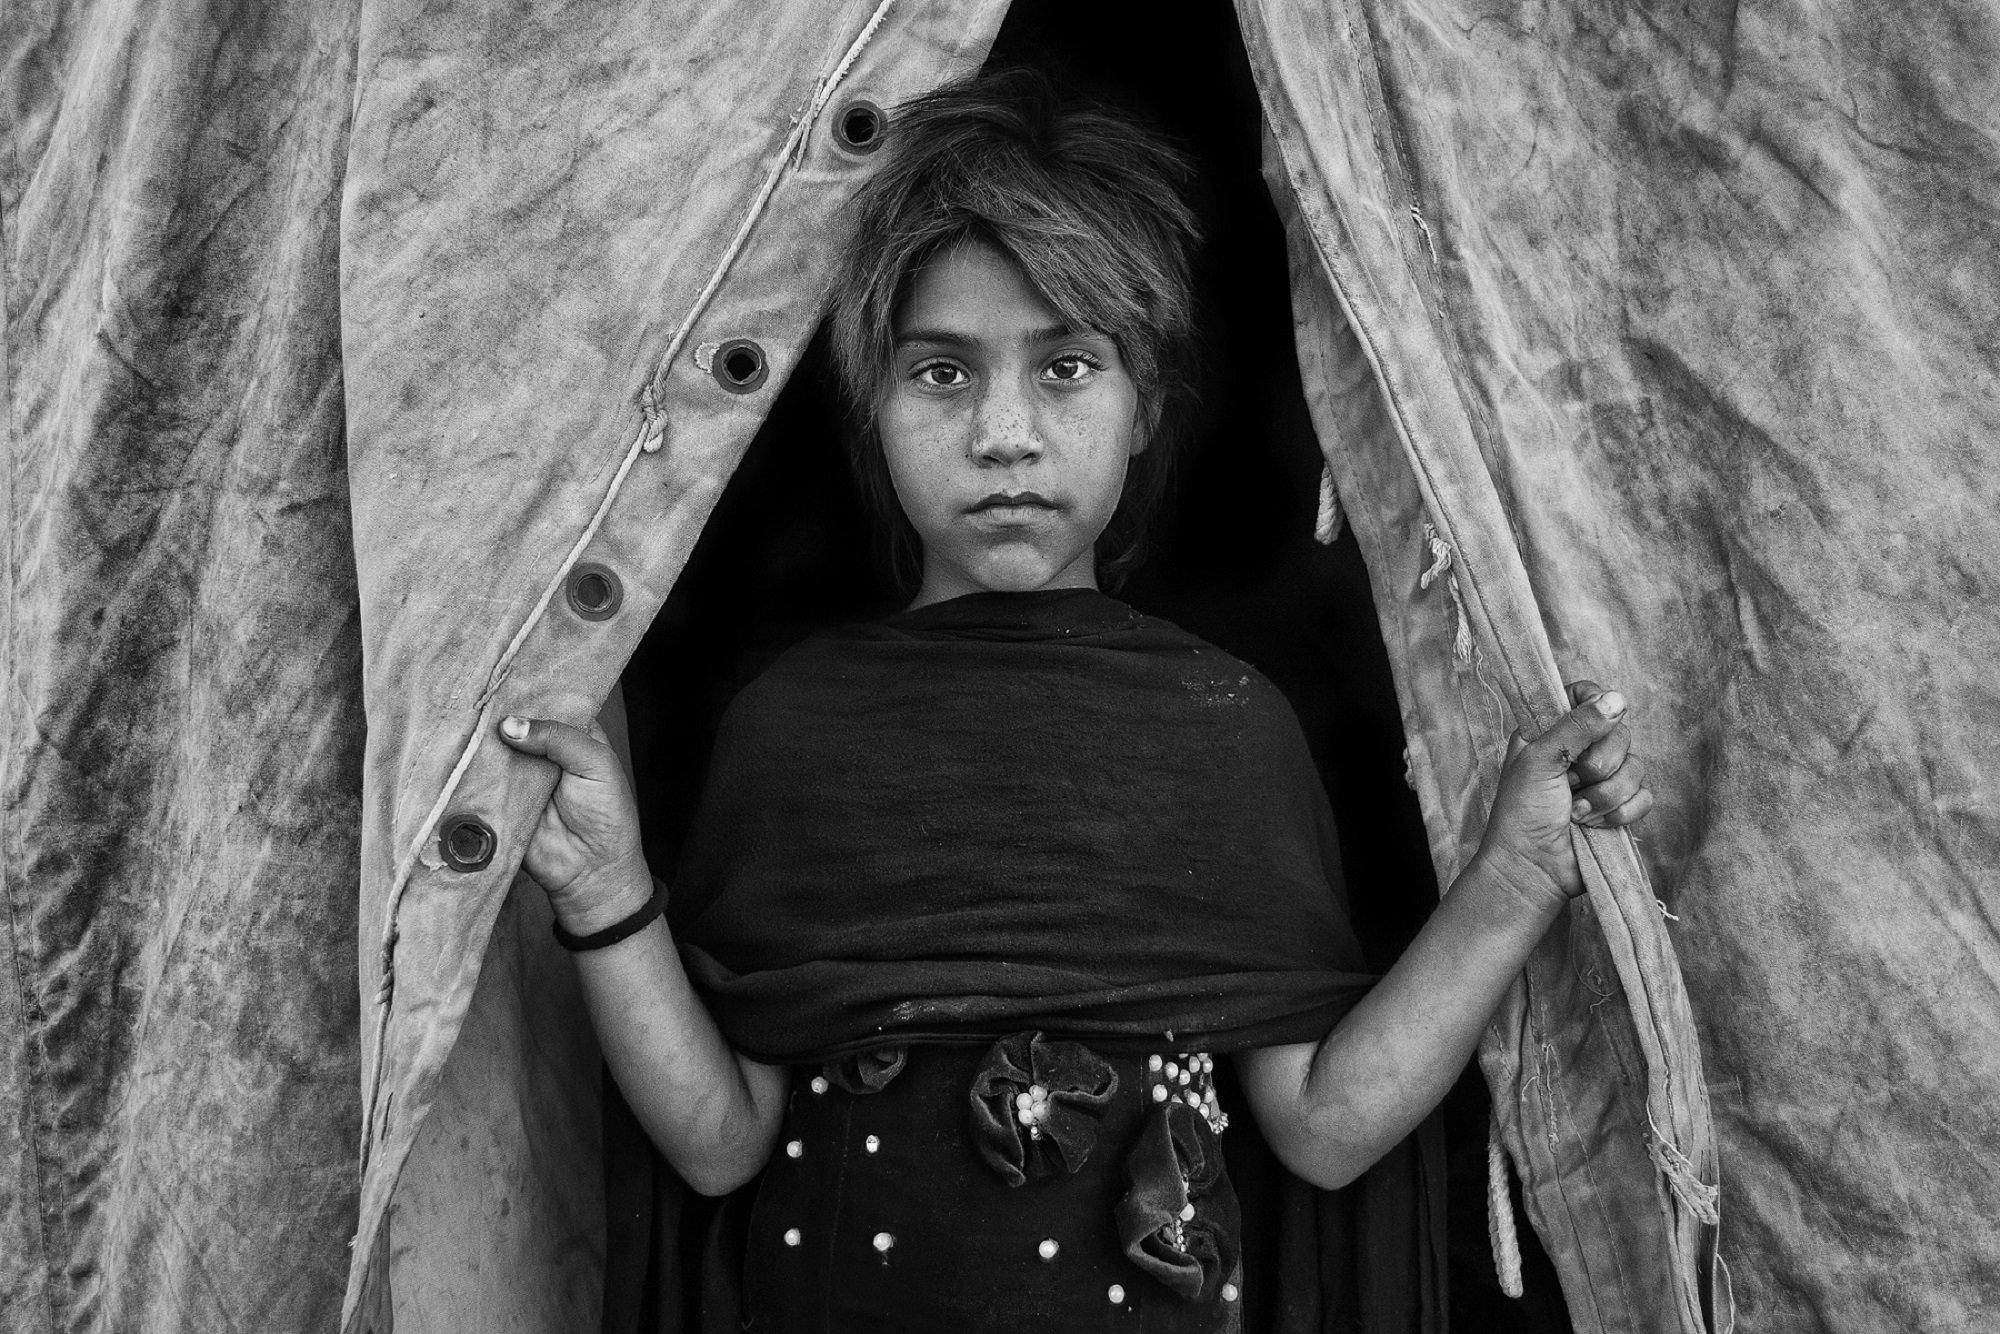 Iran Bandarabbas Mehdi Nazeri Mehdi_Nazeri Portrait Photography Girl, Mehdi Nazeri